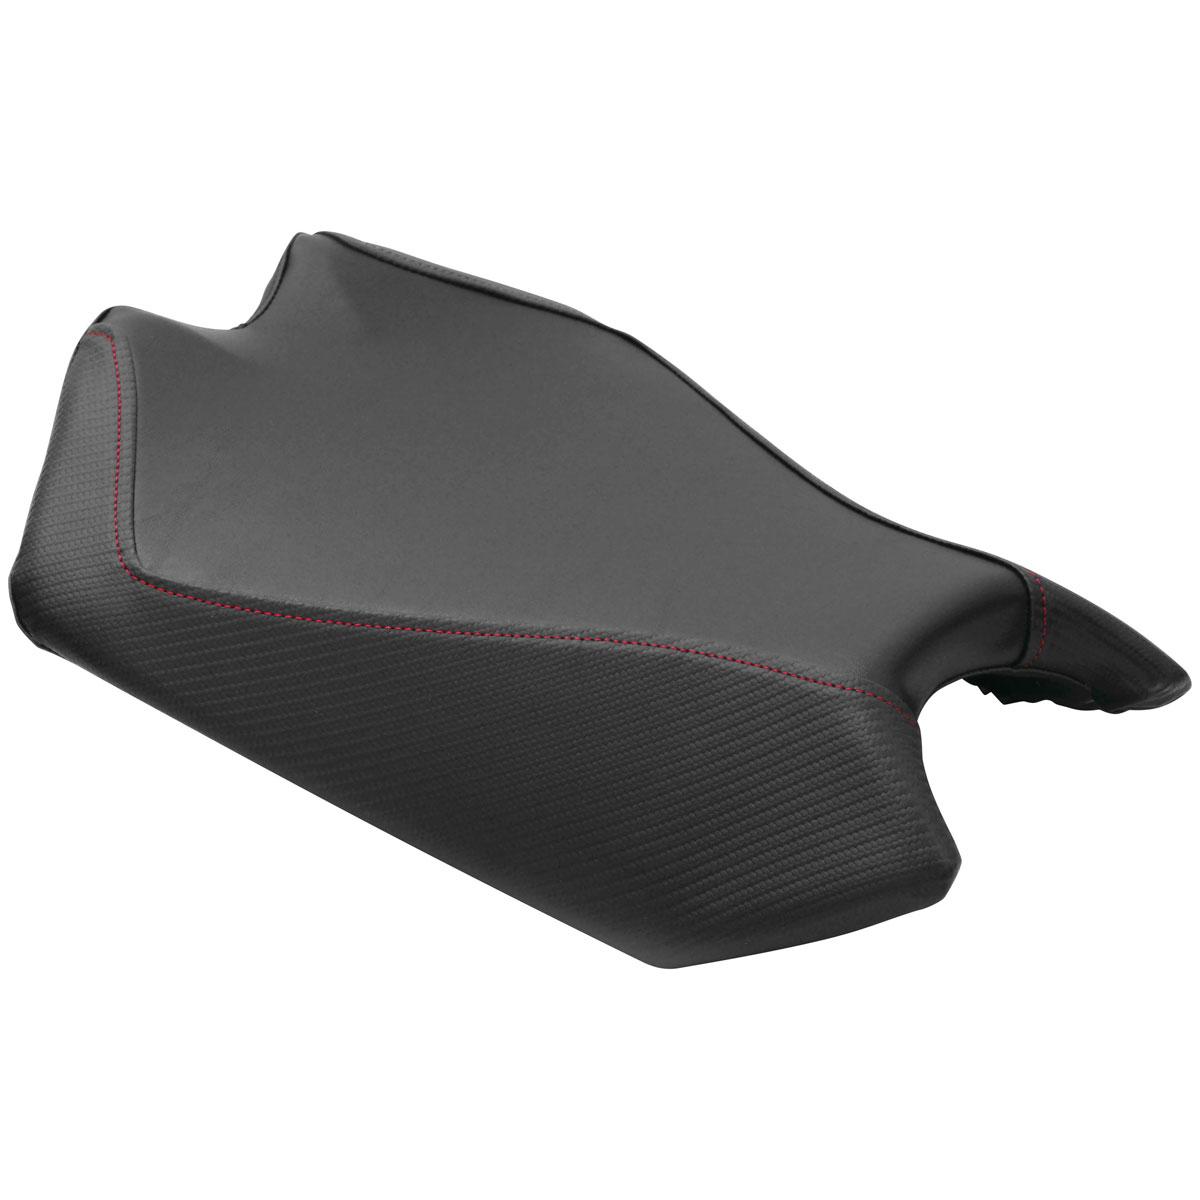 Luimoto Baseline Rider Seat Cover Sport Black/Carbon Fiber Black/Red